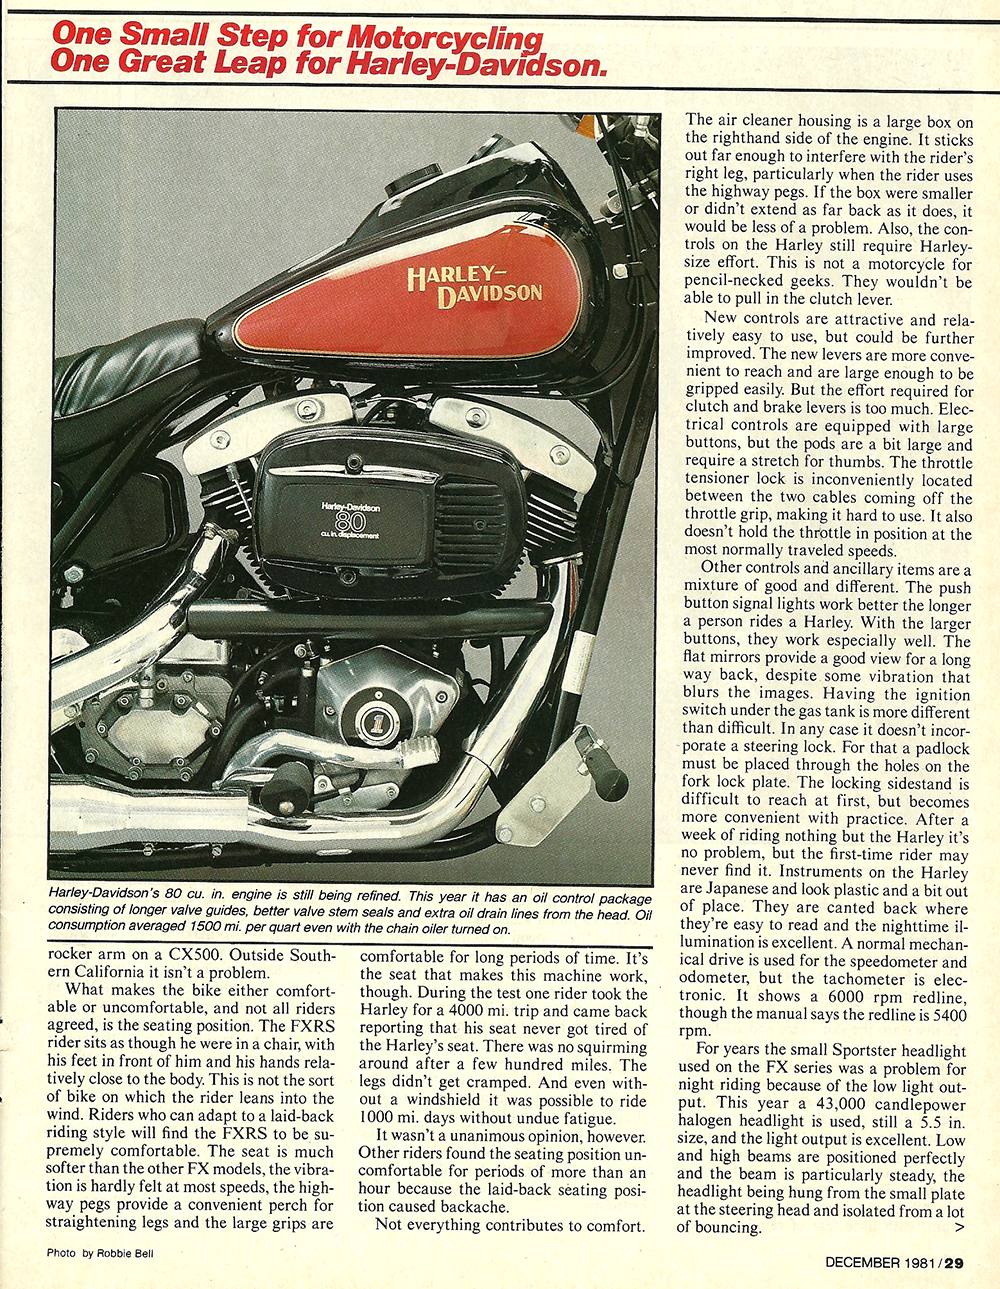 1981 Harley-Davidson FXRS road test 2.jpg